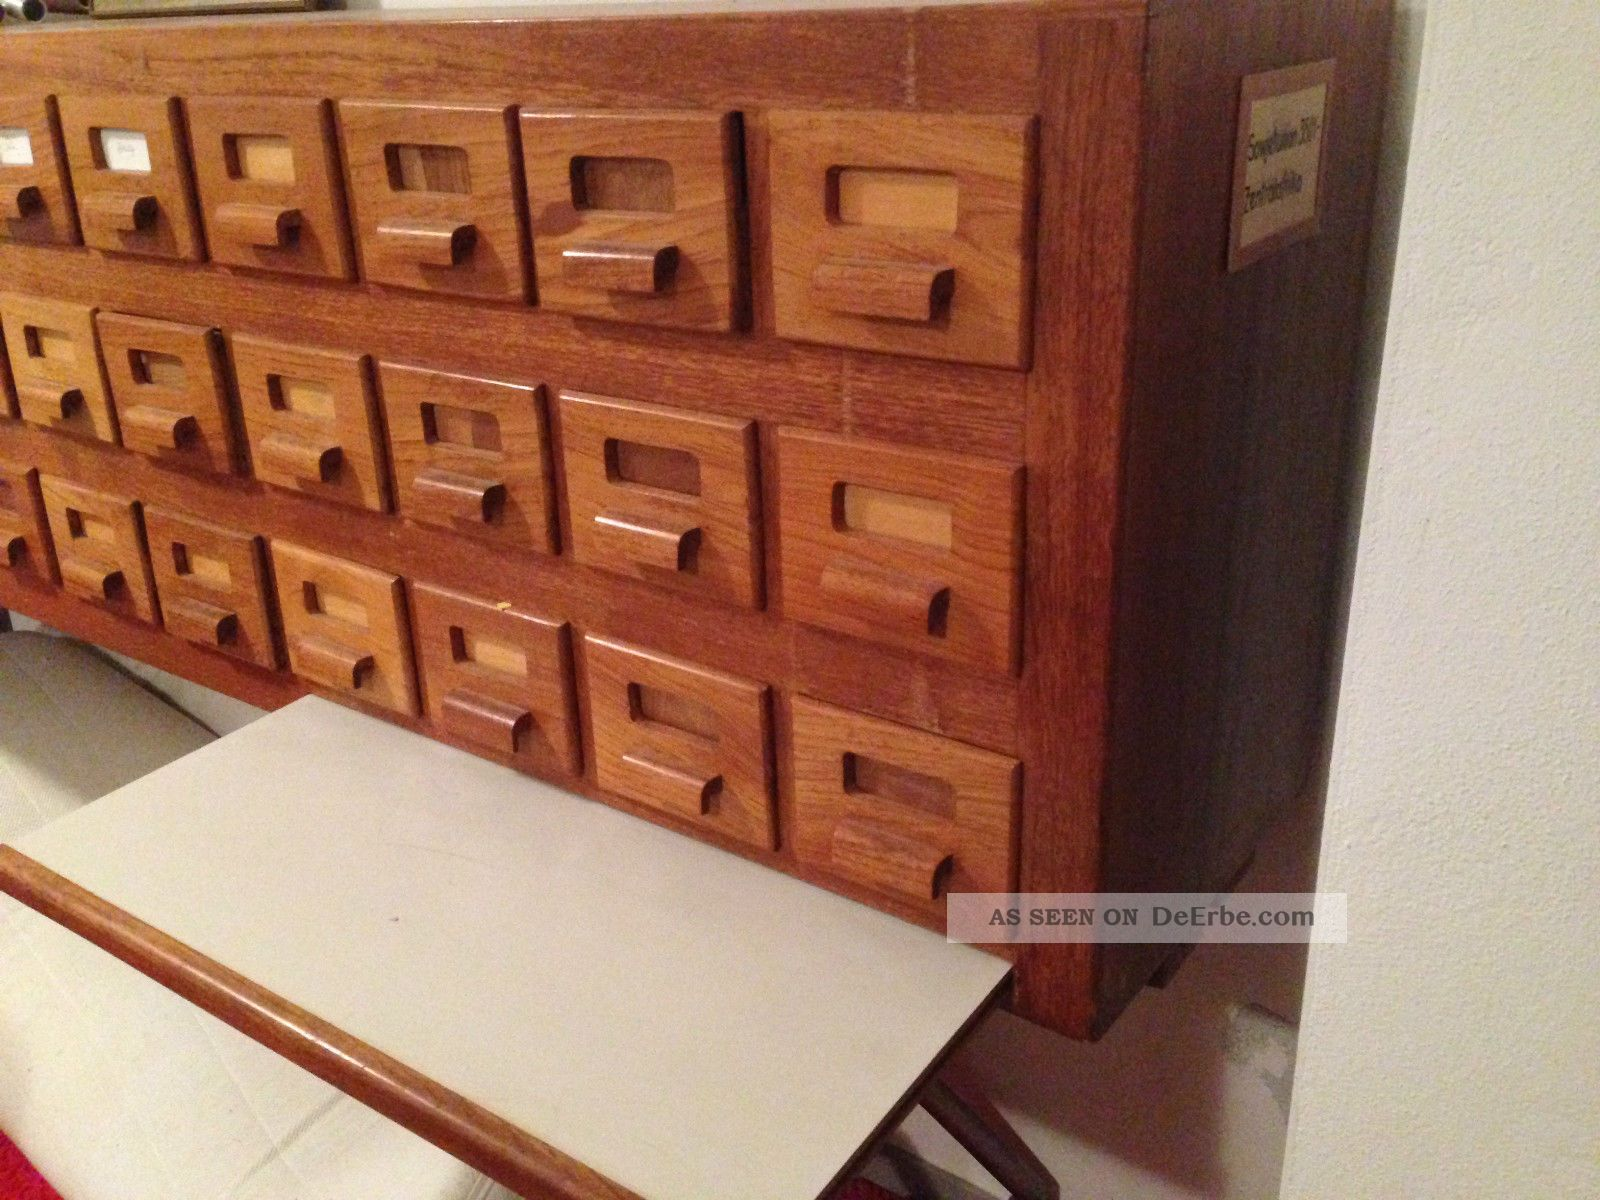 karteikartenschrank schieberschrank apothekerschrank. Black Bedroom Furniture Sets. Home Design Ideas